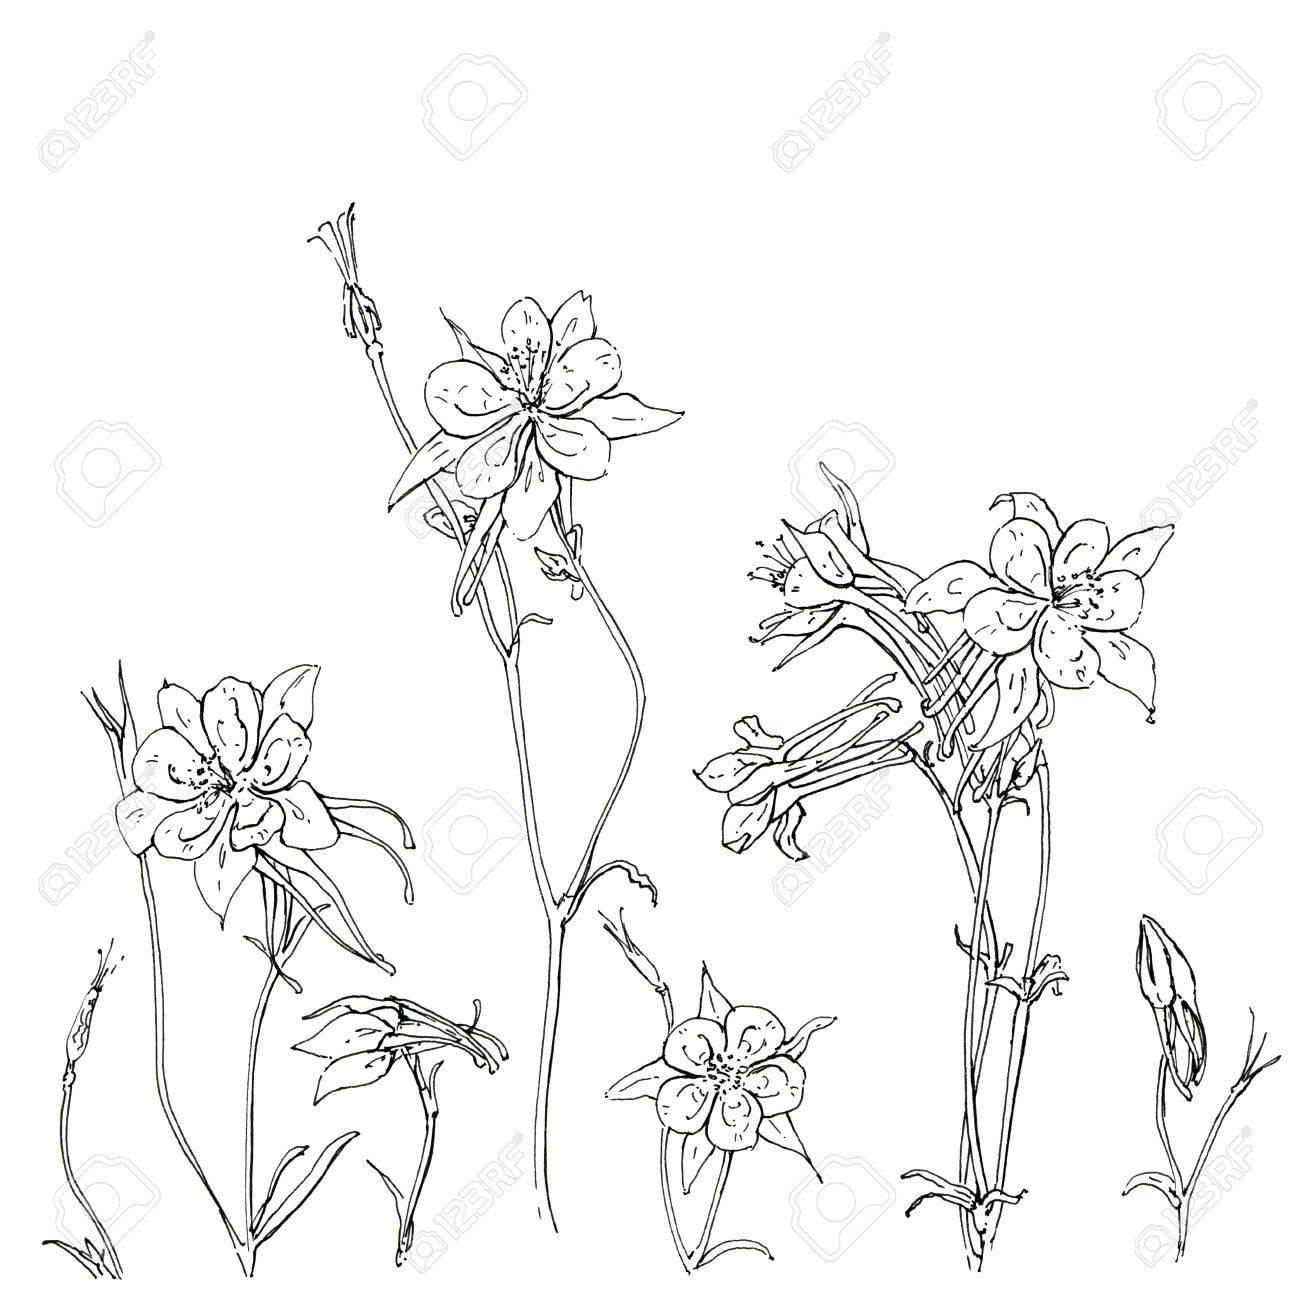 1300x1300 Hand Drawn Graphic Flower Aquilegia Columbine On White Background